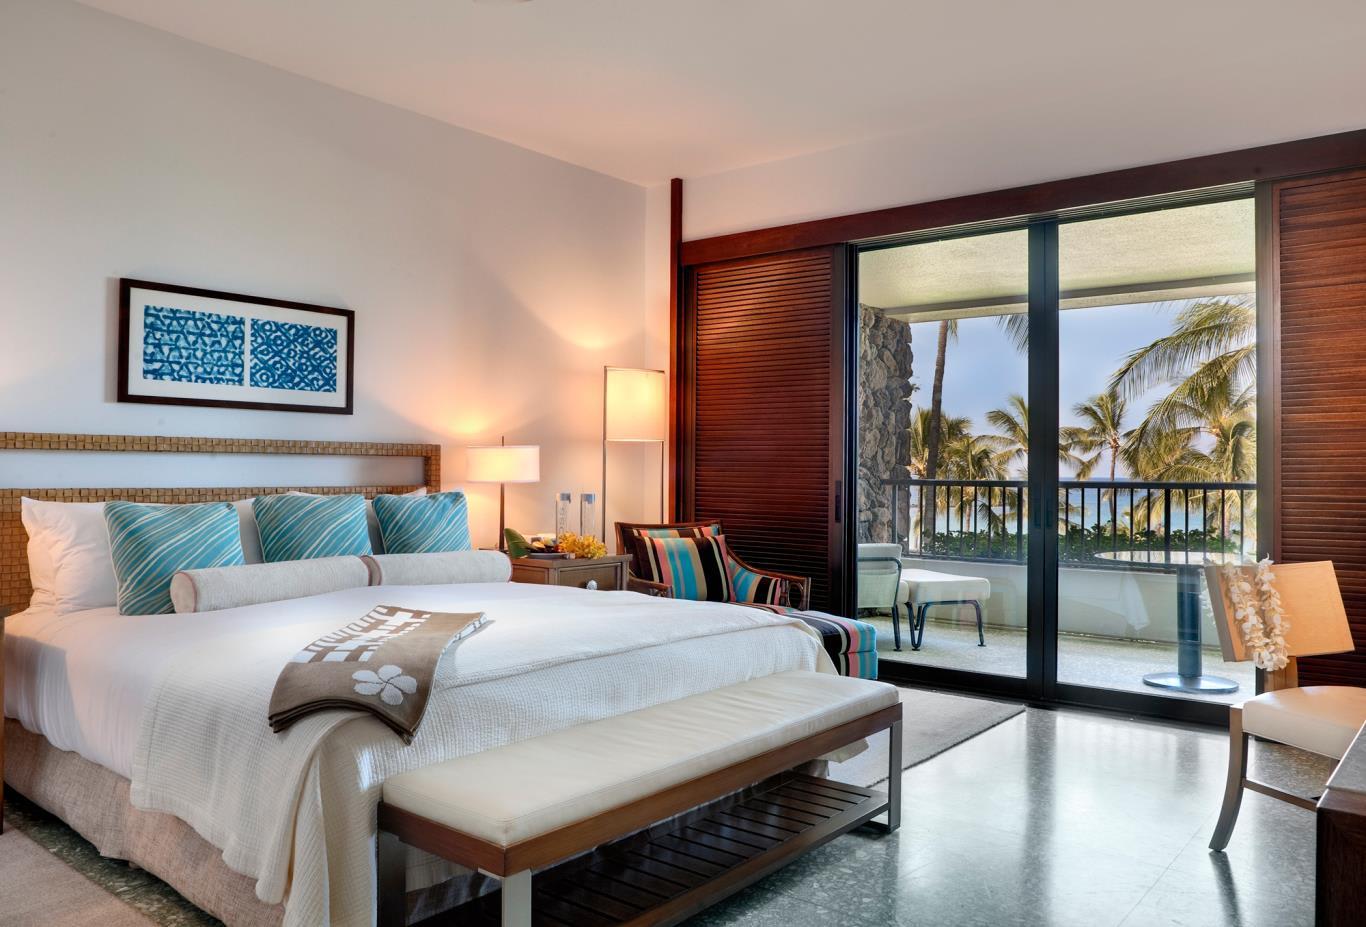 Plumeria-Beach-Club-King-Bedroom